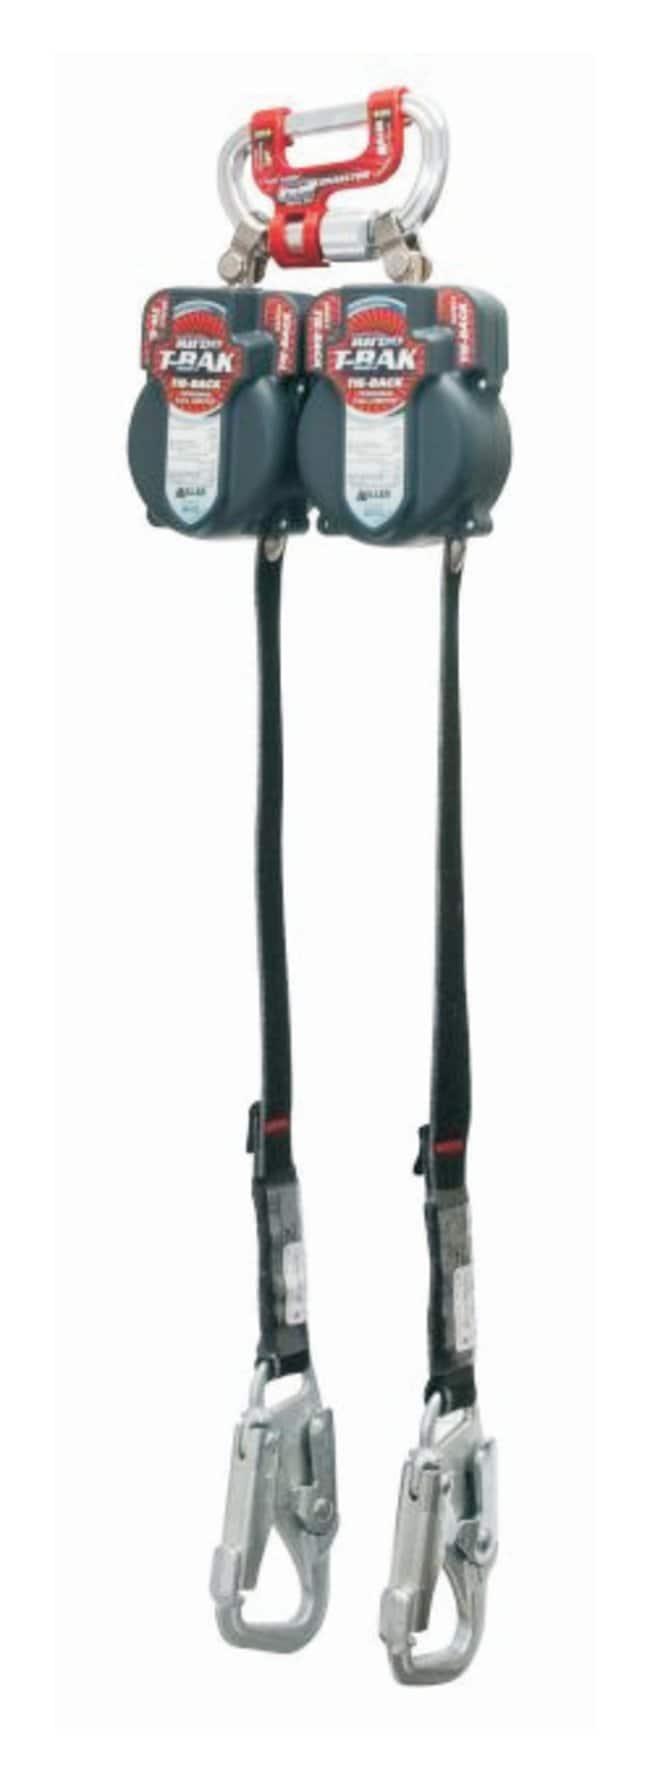 Honeywell Miller Twin Turbo T-BAK G2 Fall Protection System T-Bak Fall